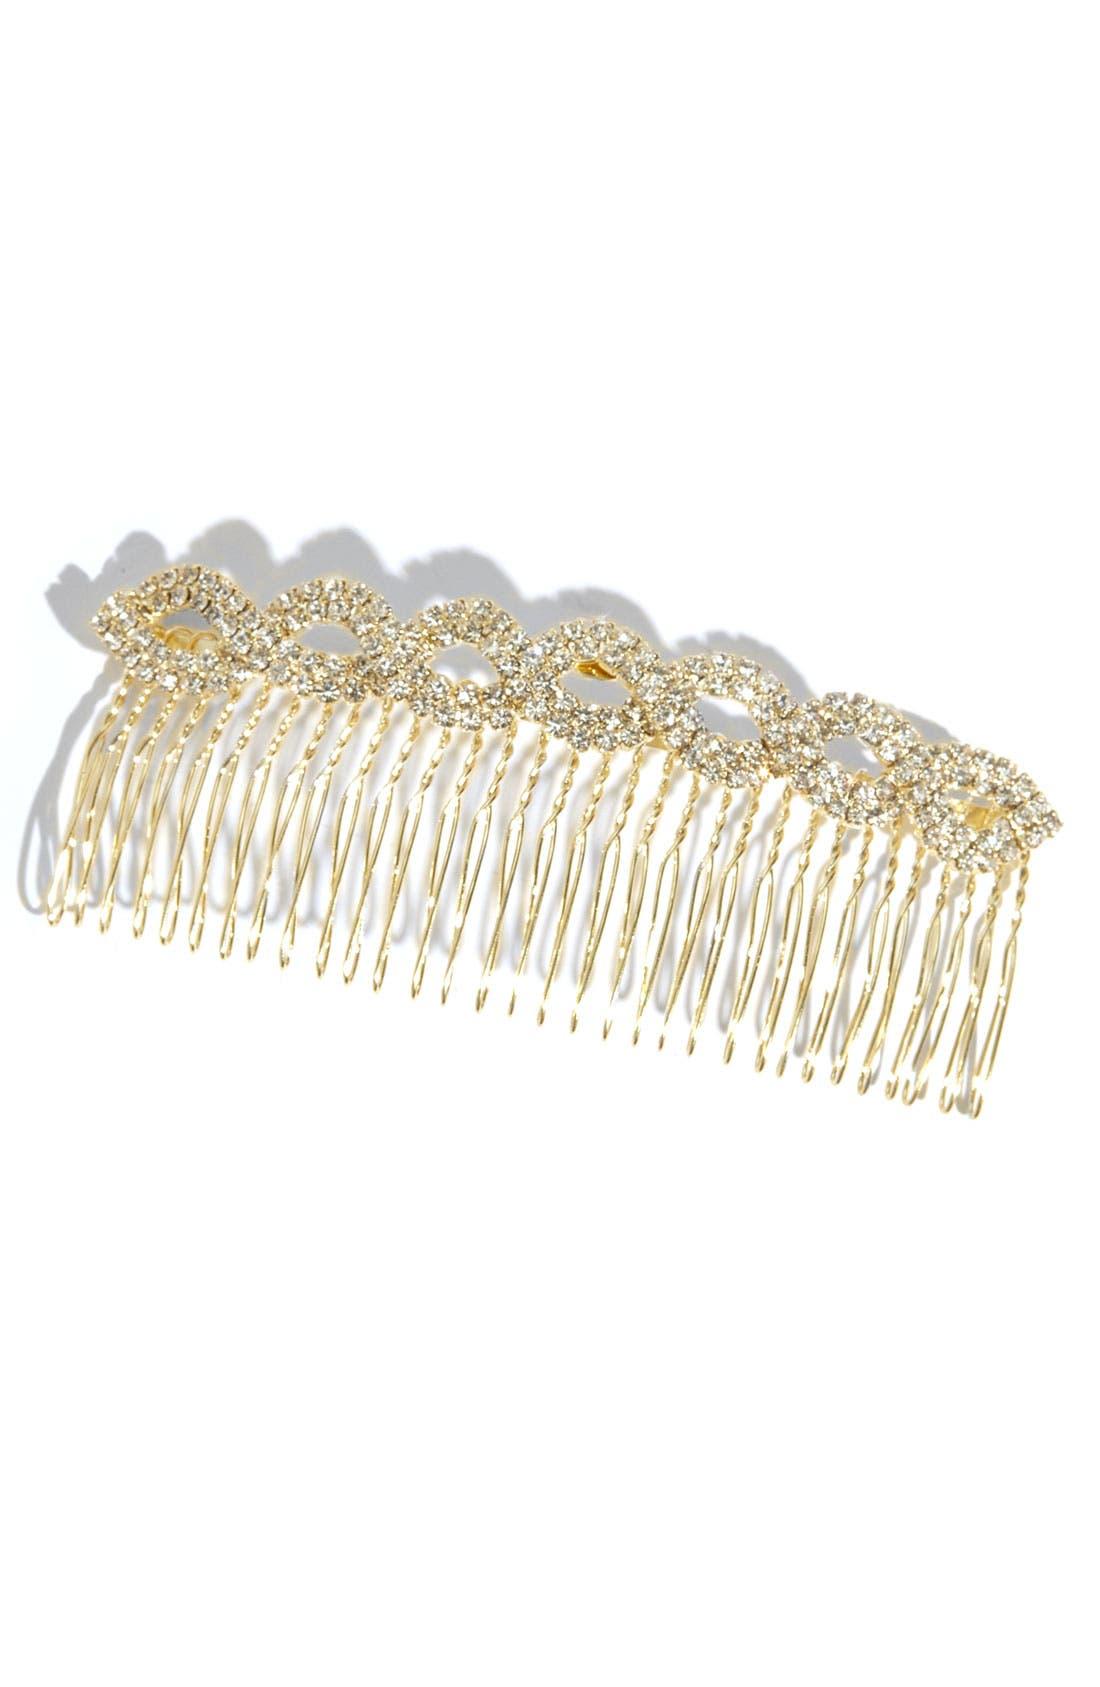 Main Image - Cara 'Infinity - Large' Hair Comb